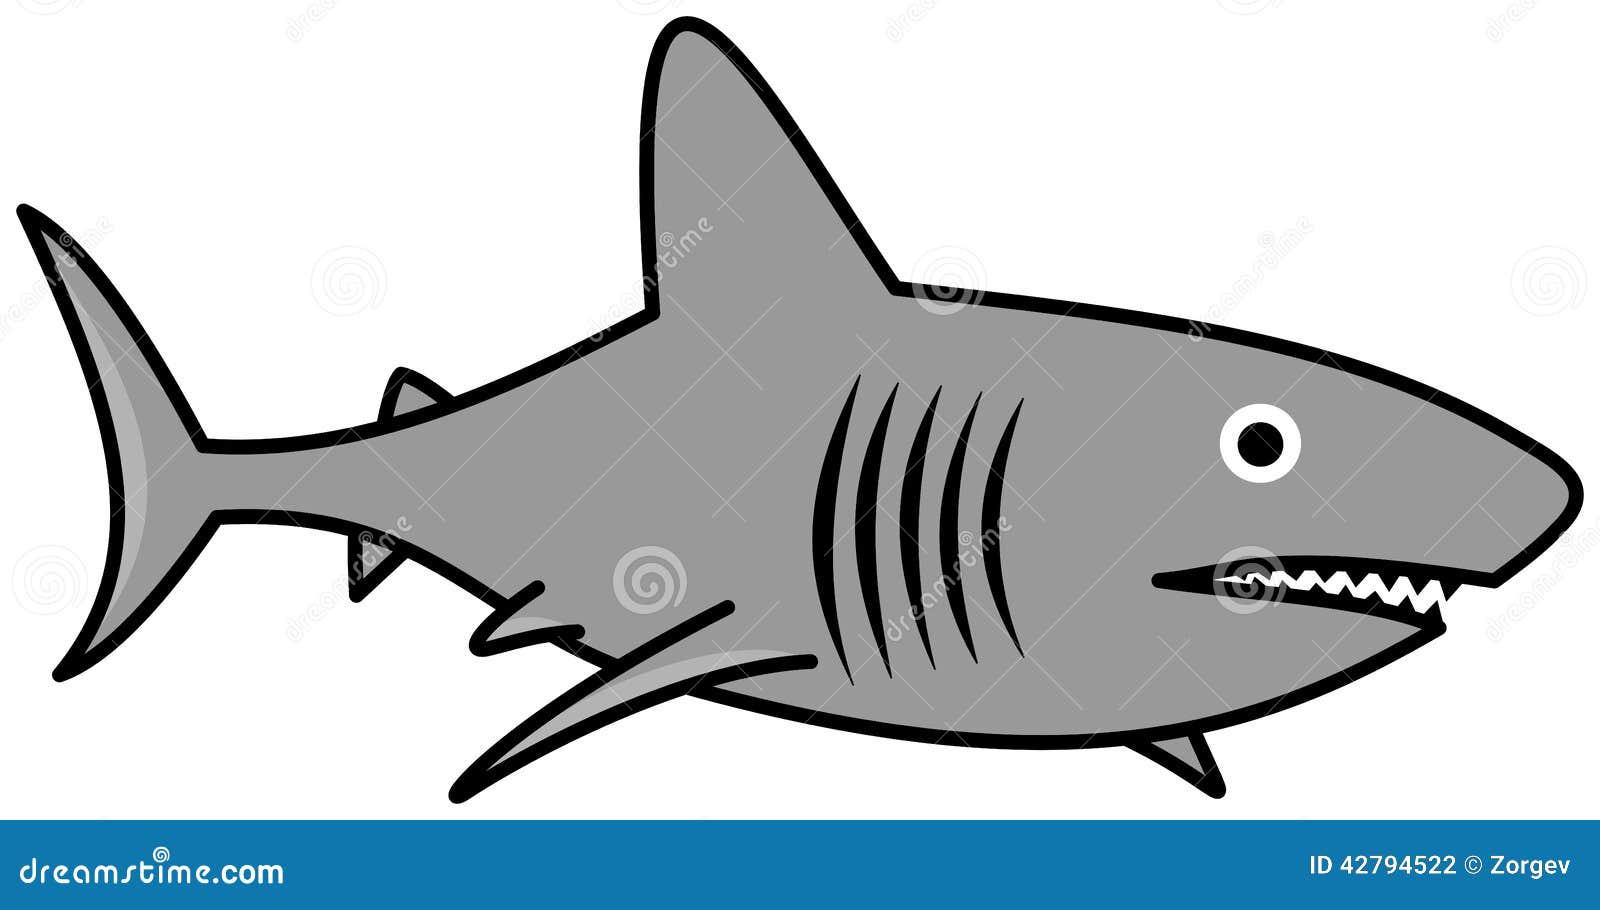 A Gray Shark Swimming Stock Illustration - Image: 42794522